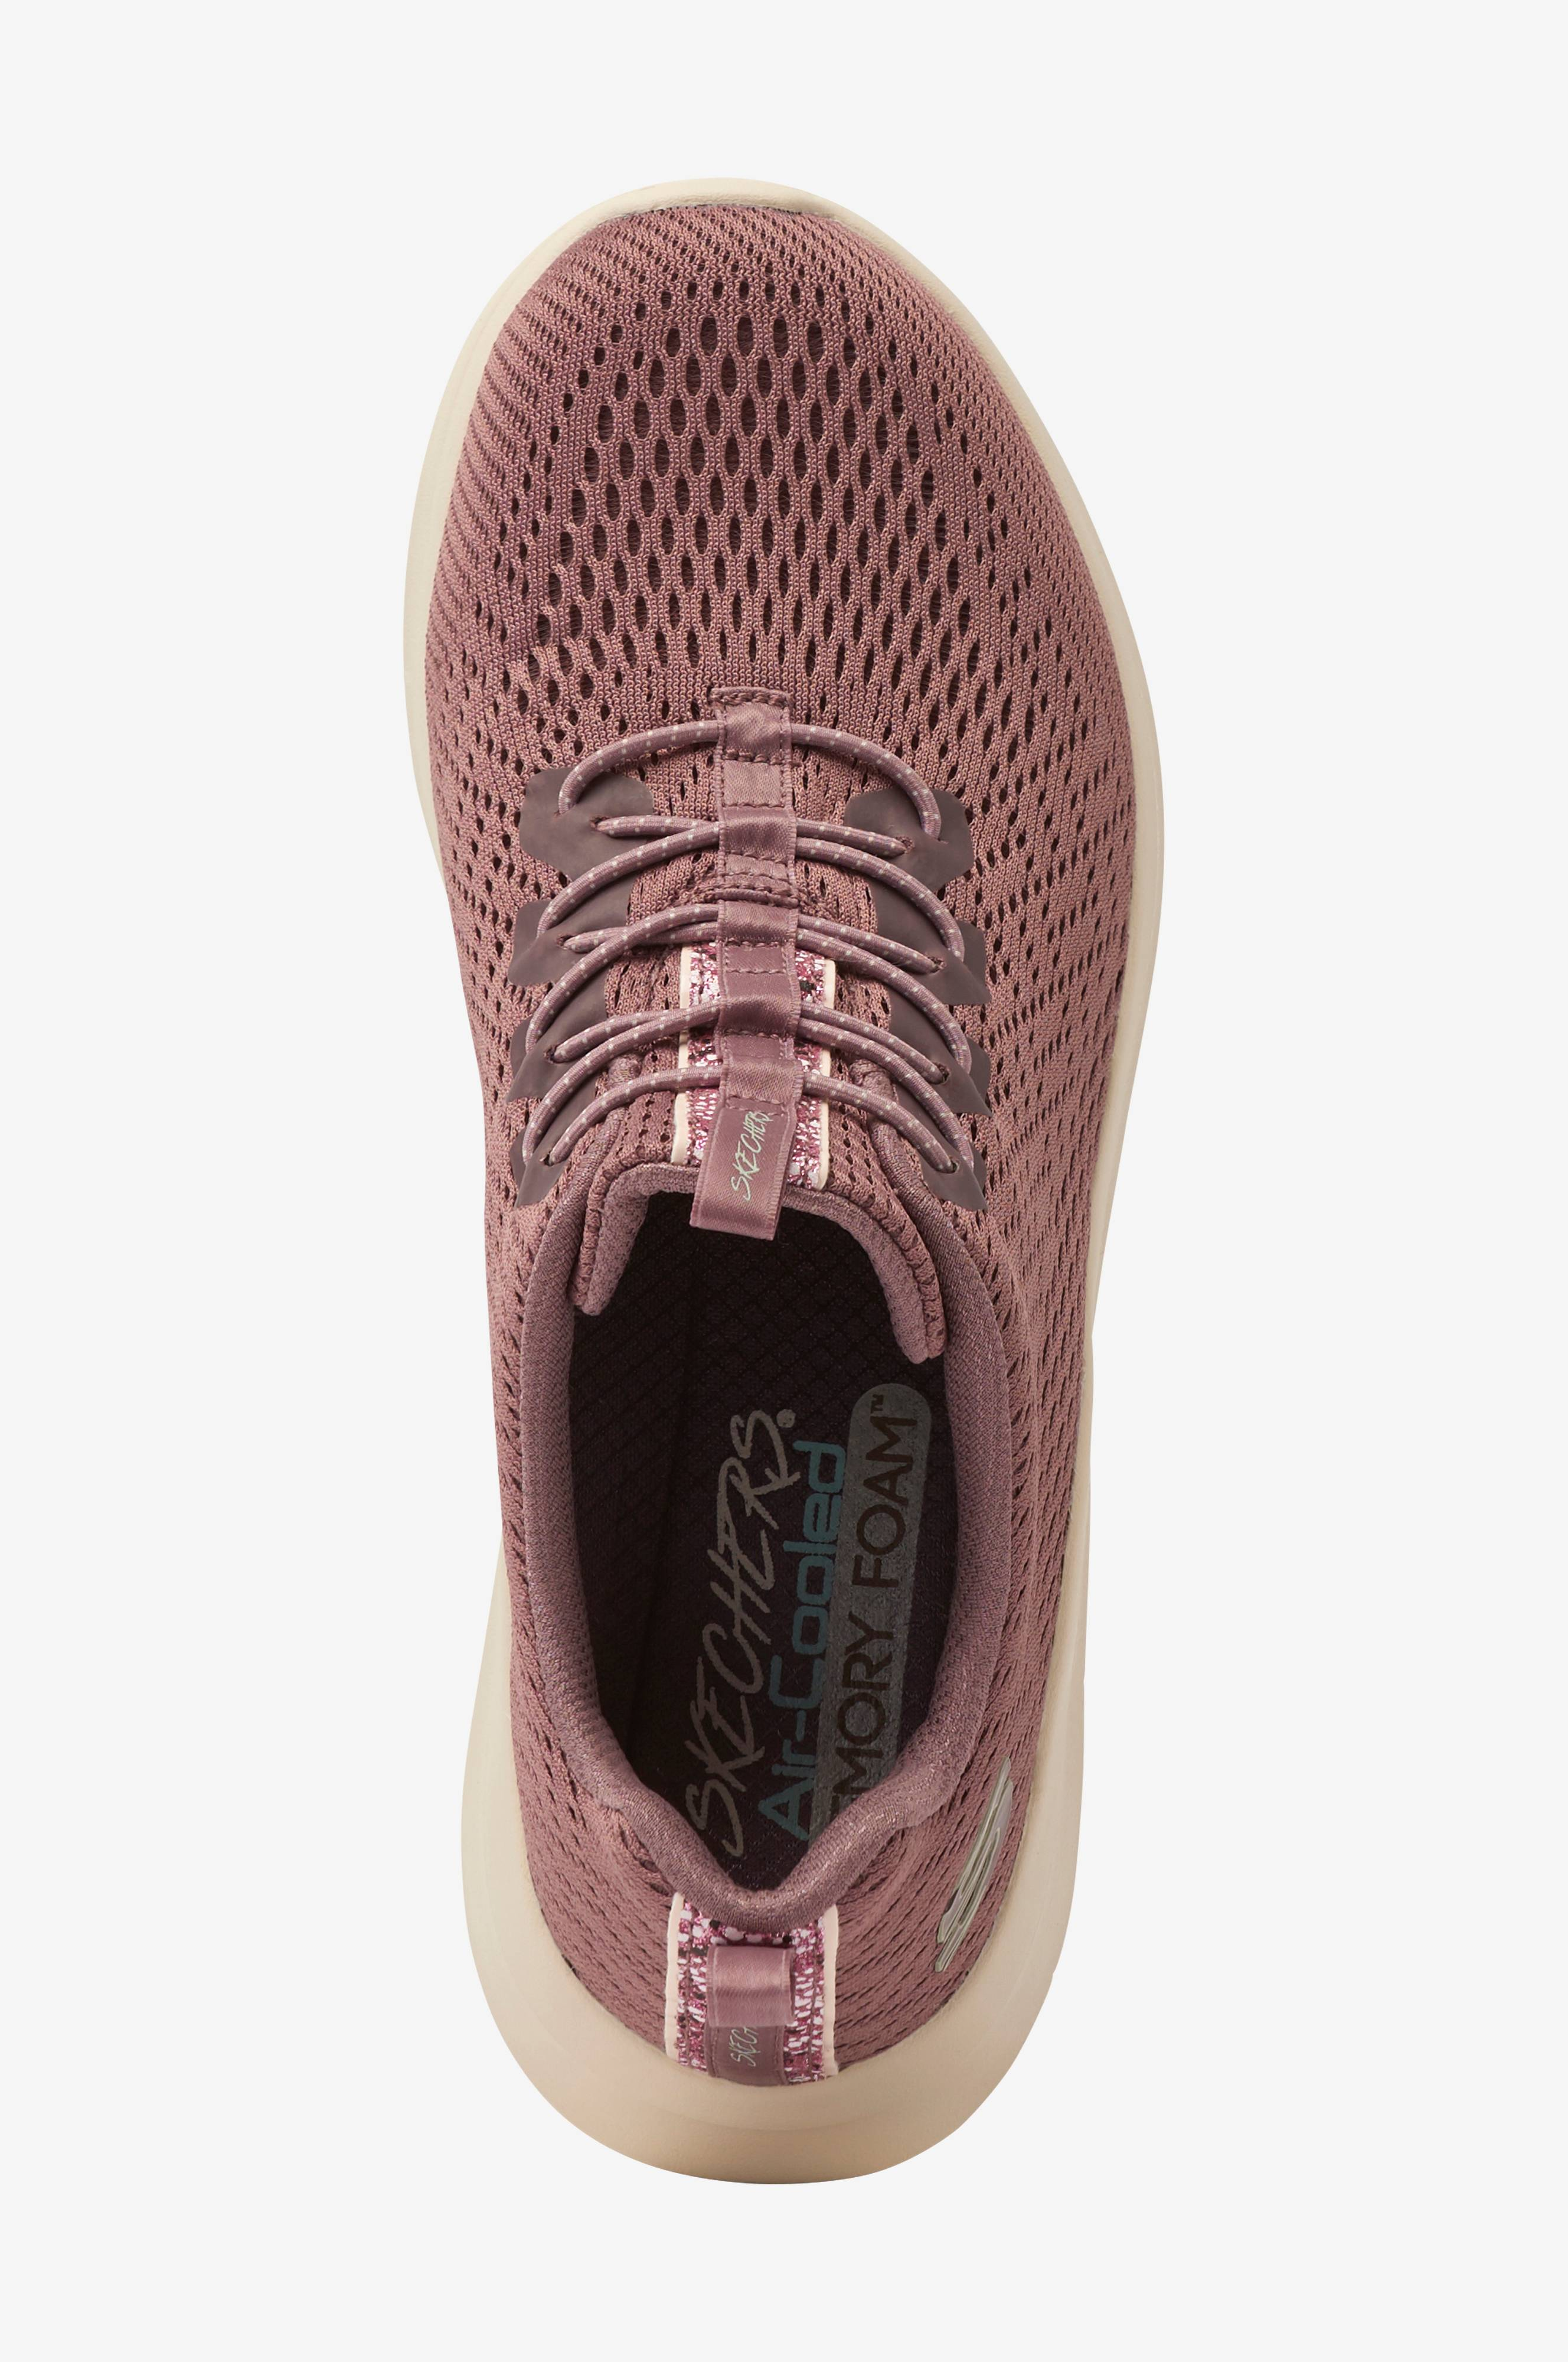 Perceptivo Surrey Regresa  Skechers Sneakers Womens Ultra Flex 2.0 Lite-Groove - Lilla - Treningssko -  Ellos.no